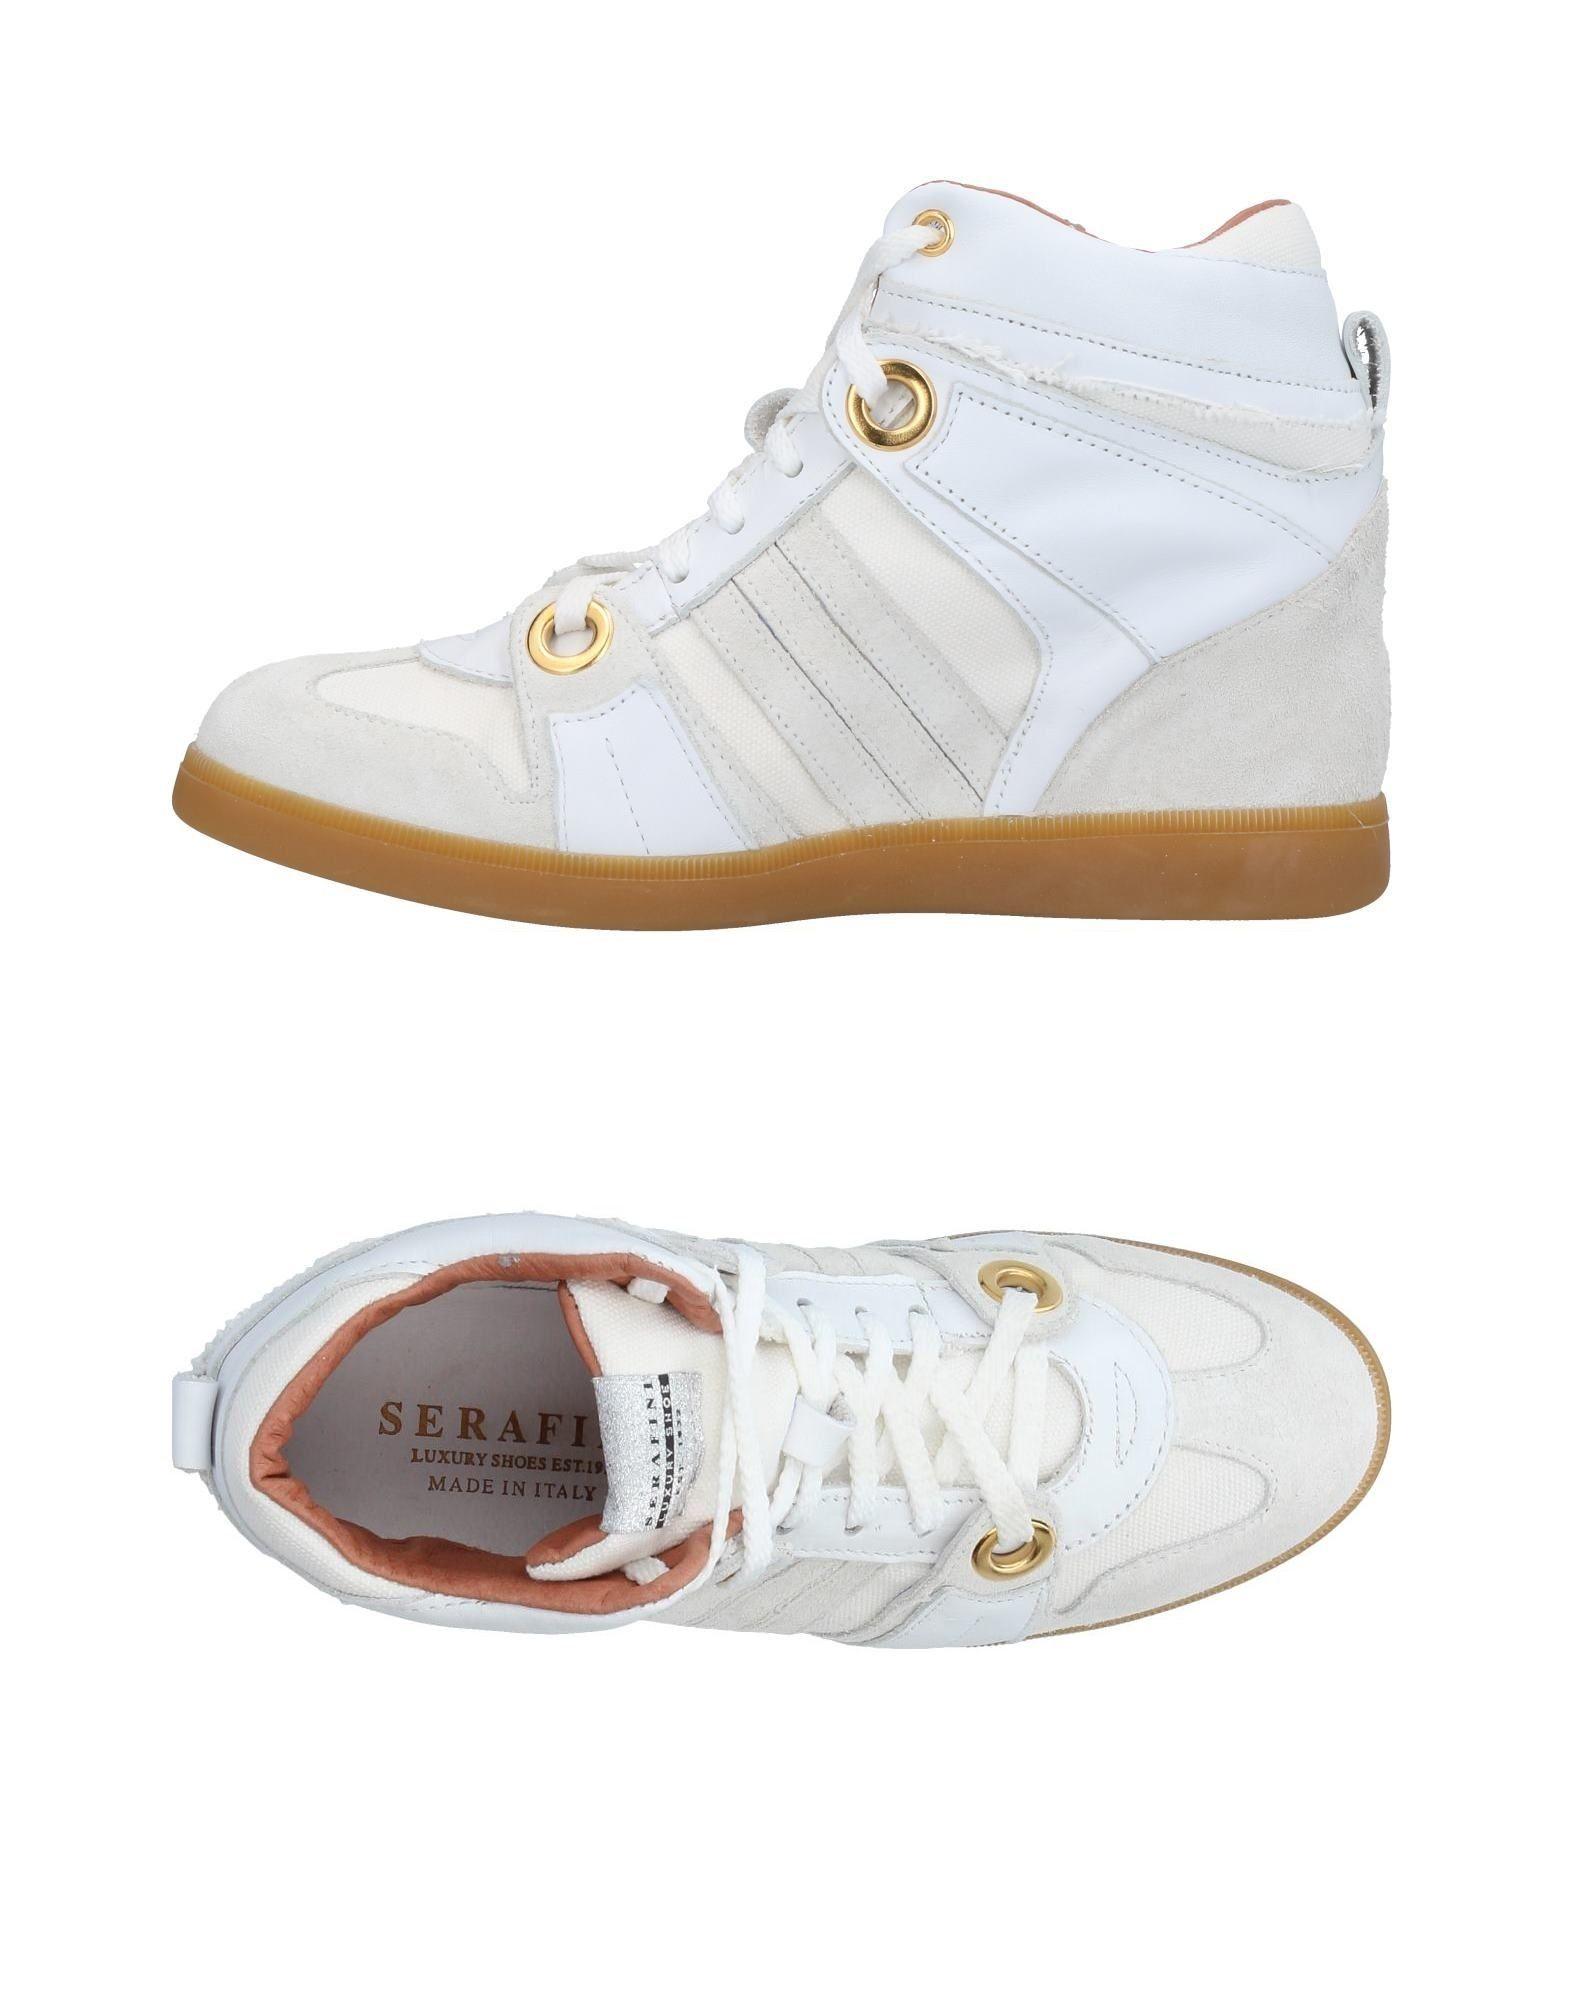 SERAFINI LUXURY Damen High Sneakers & Tennisschuhe Farbe Weiß Größe 13 jetztbilligerkaufen